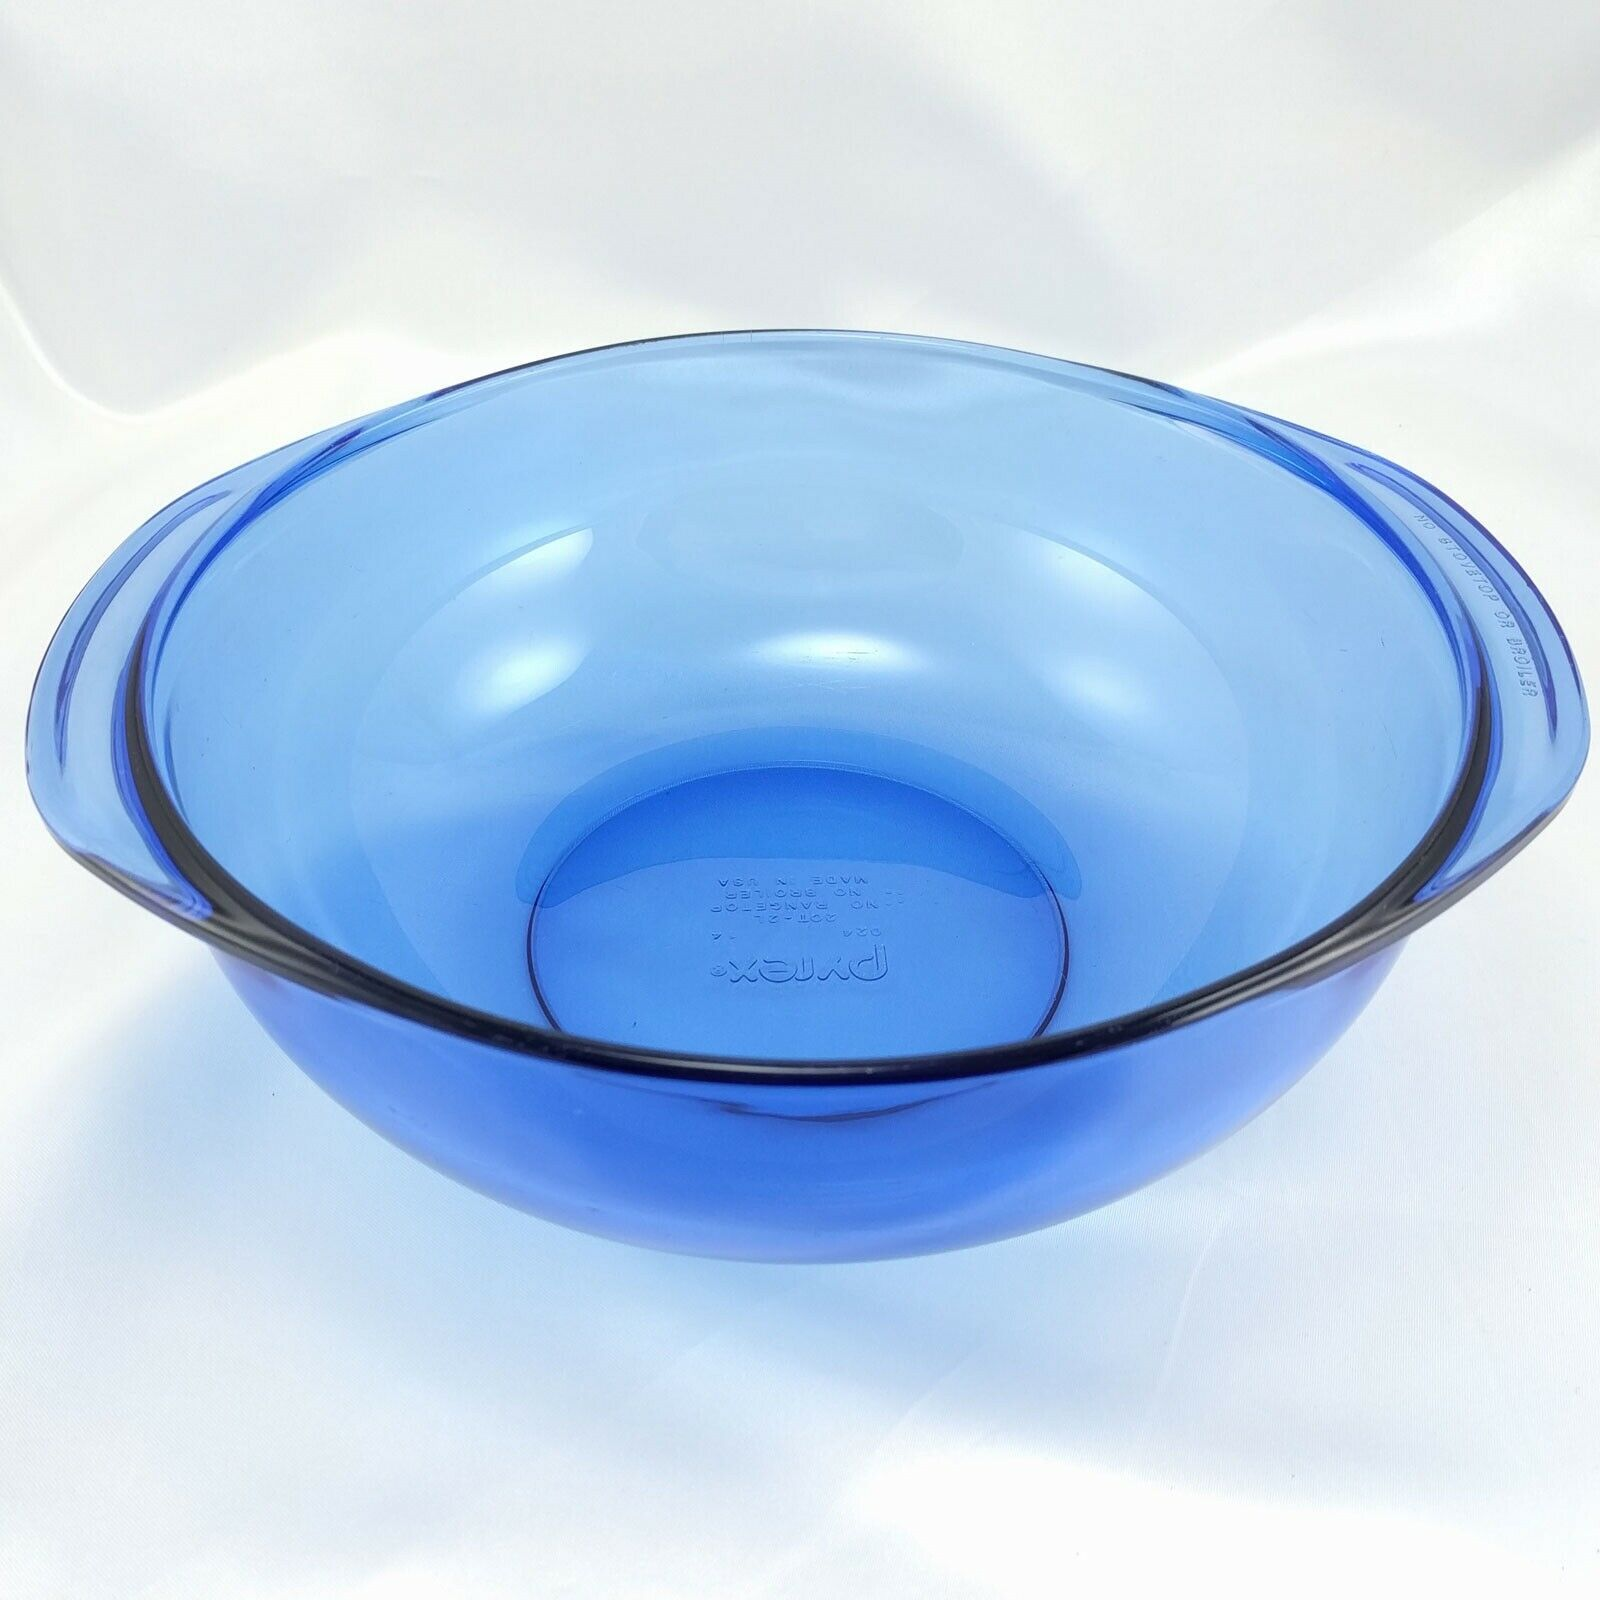 Pyrex 024 Cobalt Blue Bowl 2 qt Serving Casserole w/ 024C Lid Made in the USA image 4